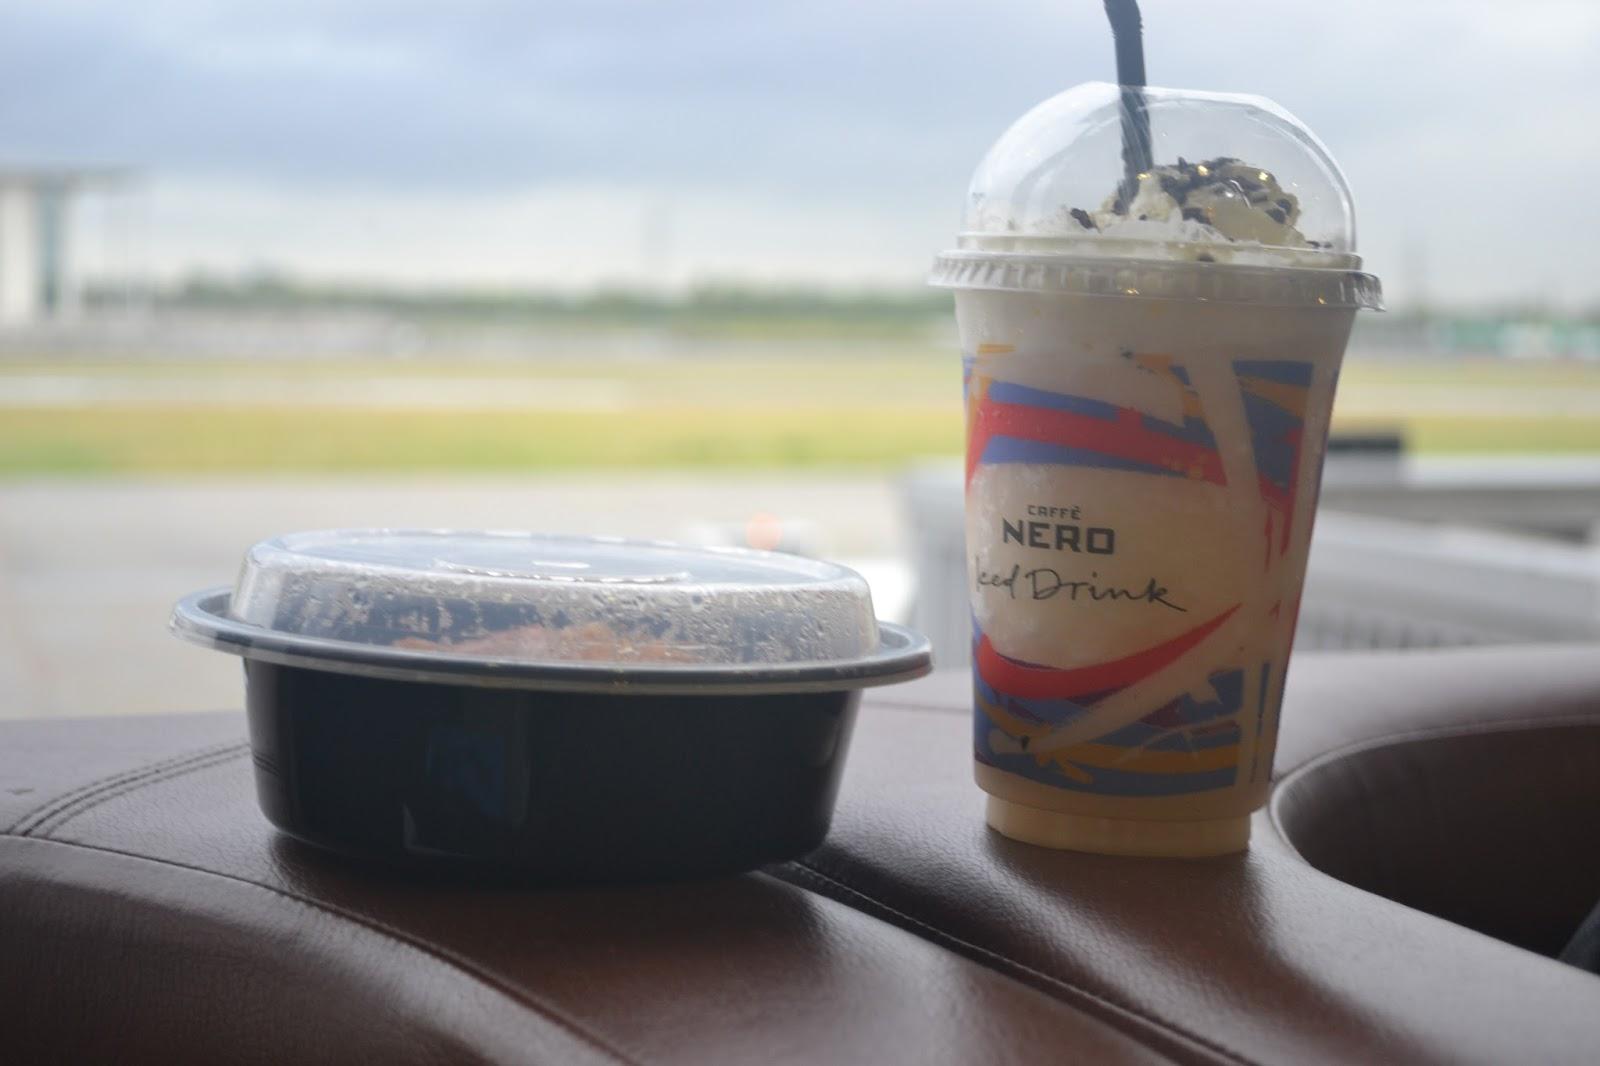 Caffe Nero Frappucino at the Airport